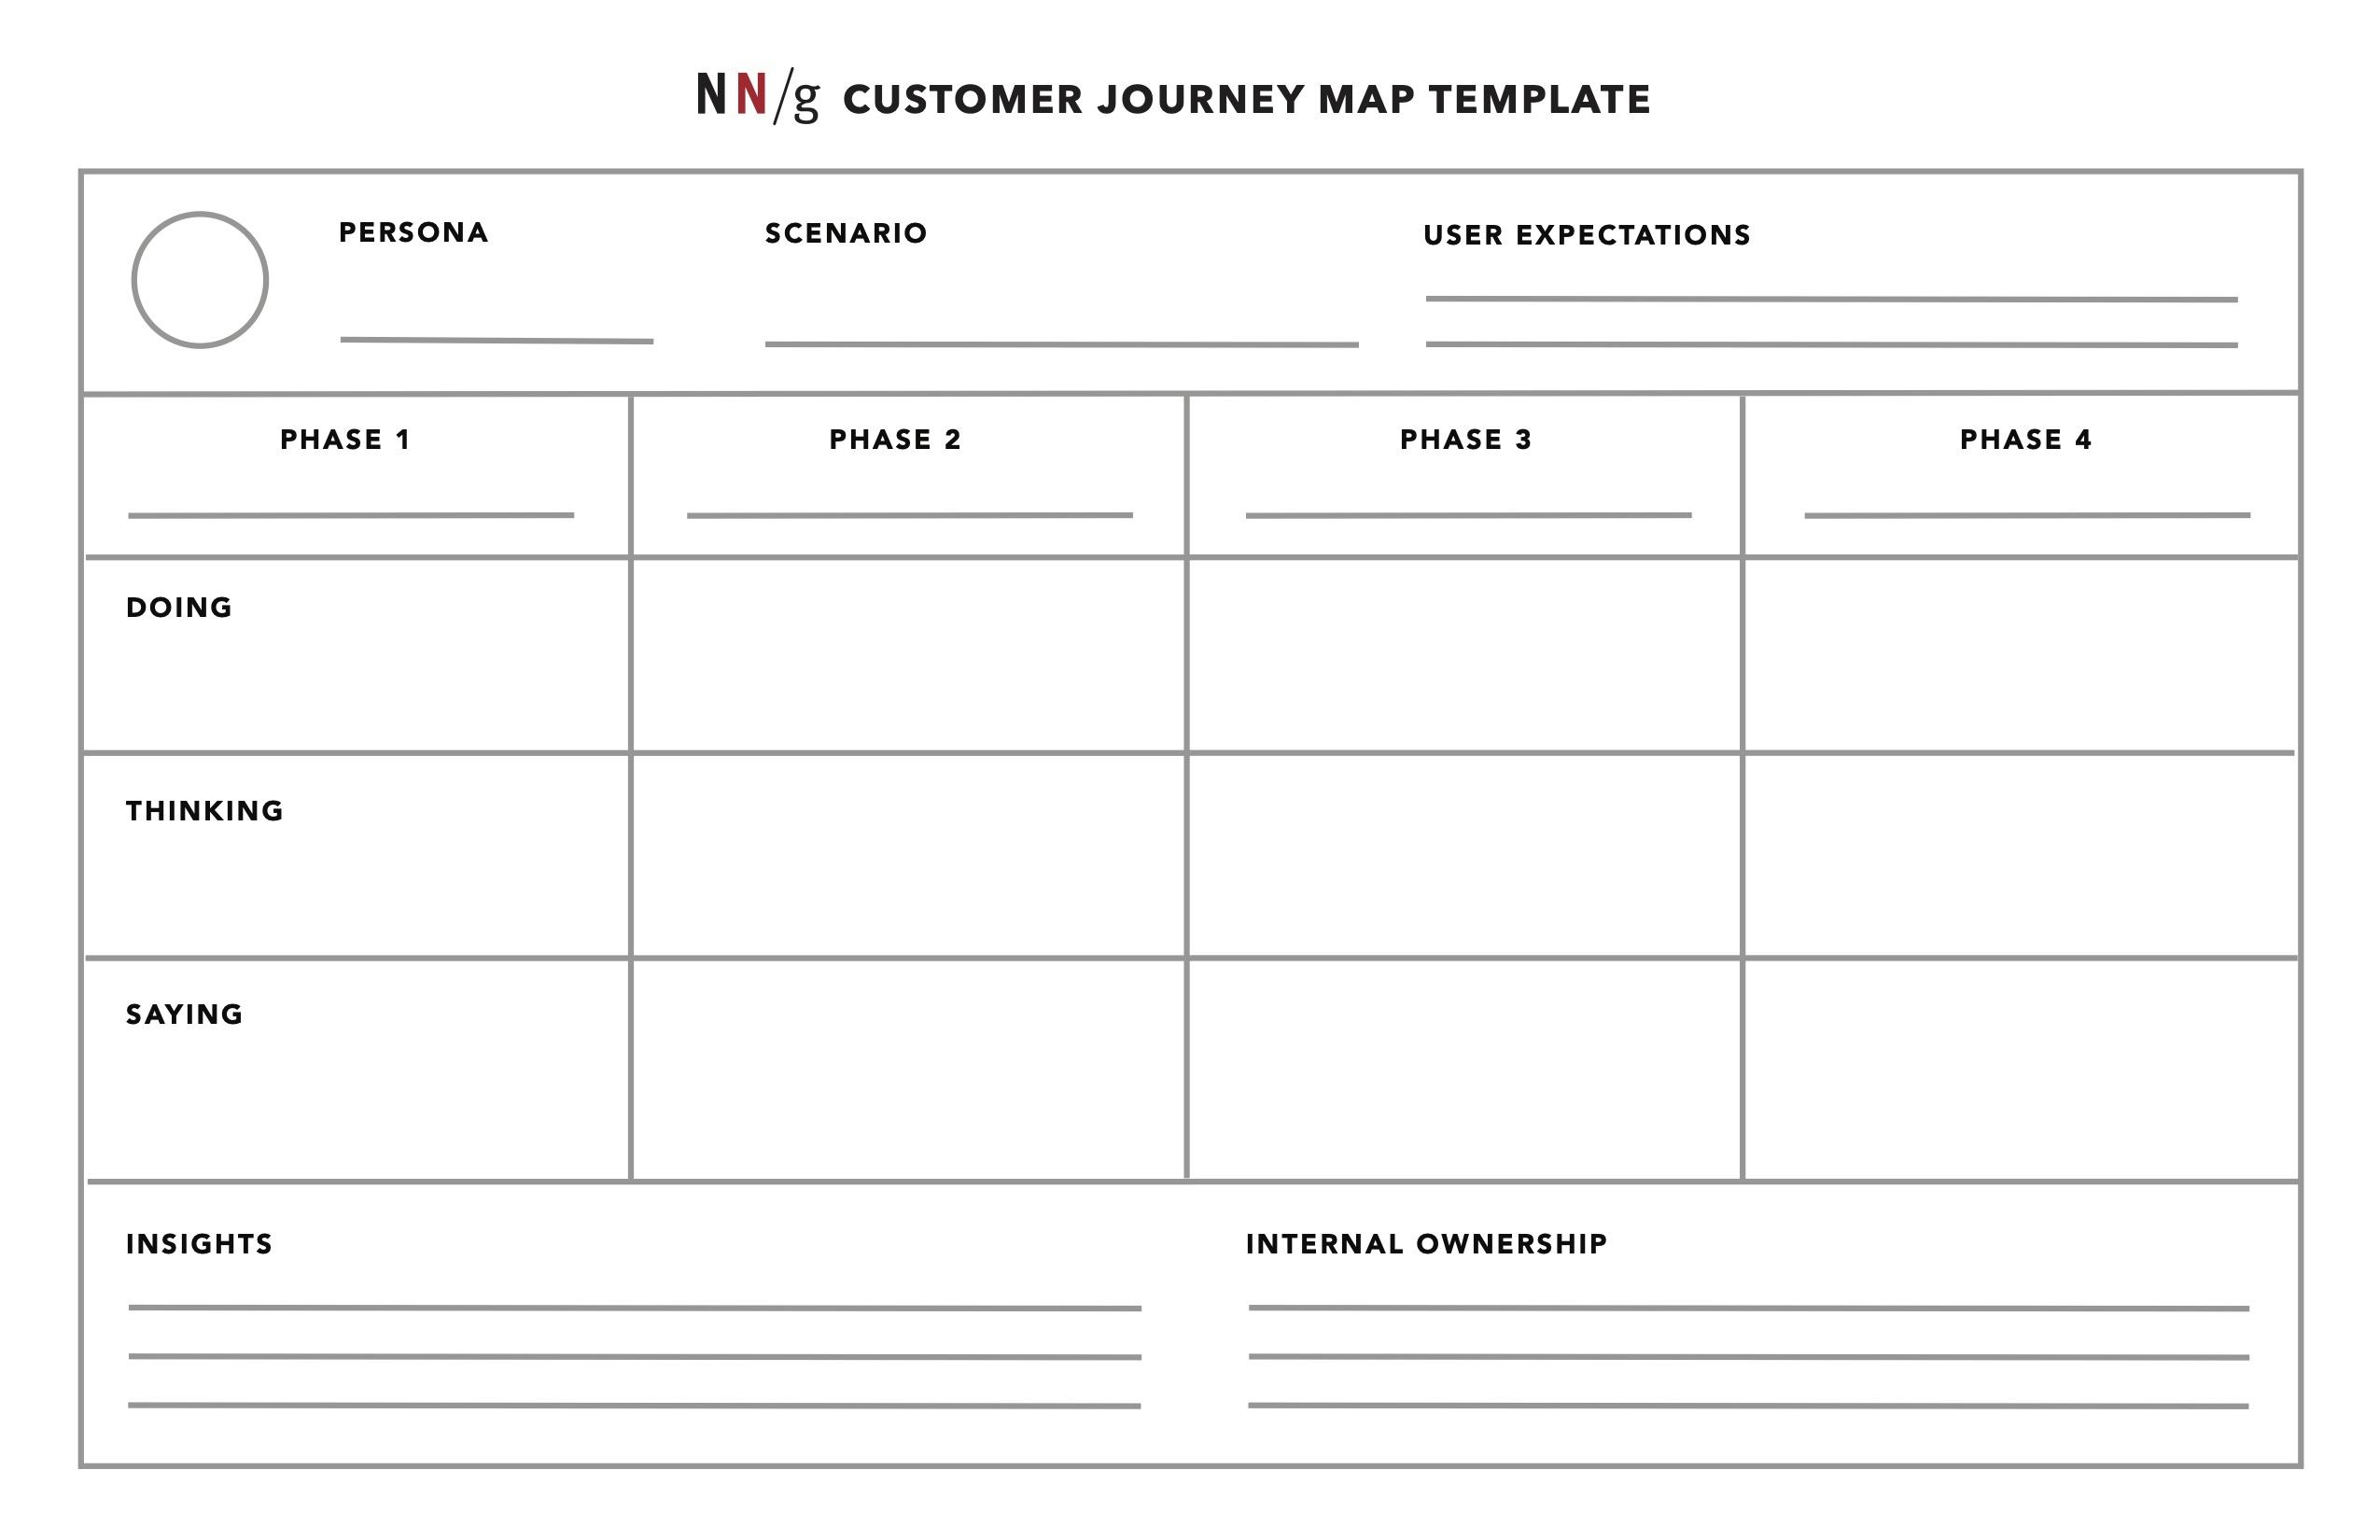 nielsen norman group customer journey map template plain pdf download